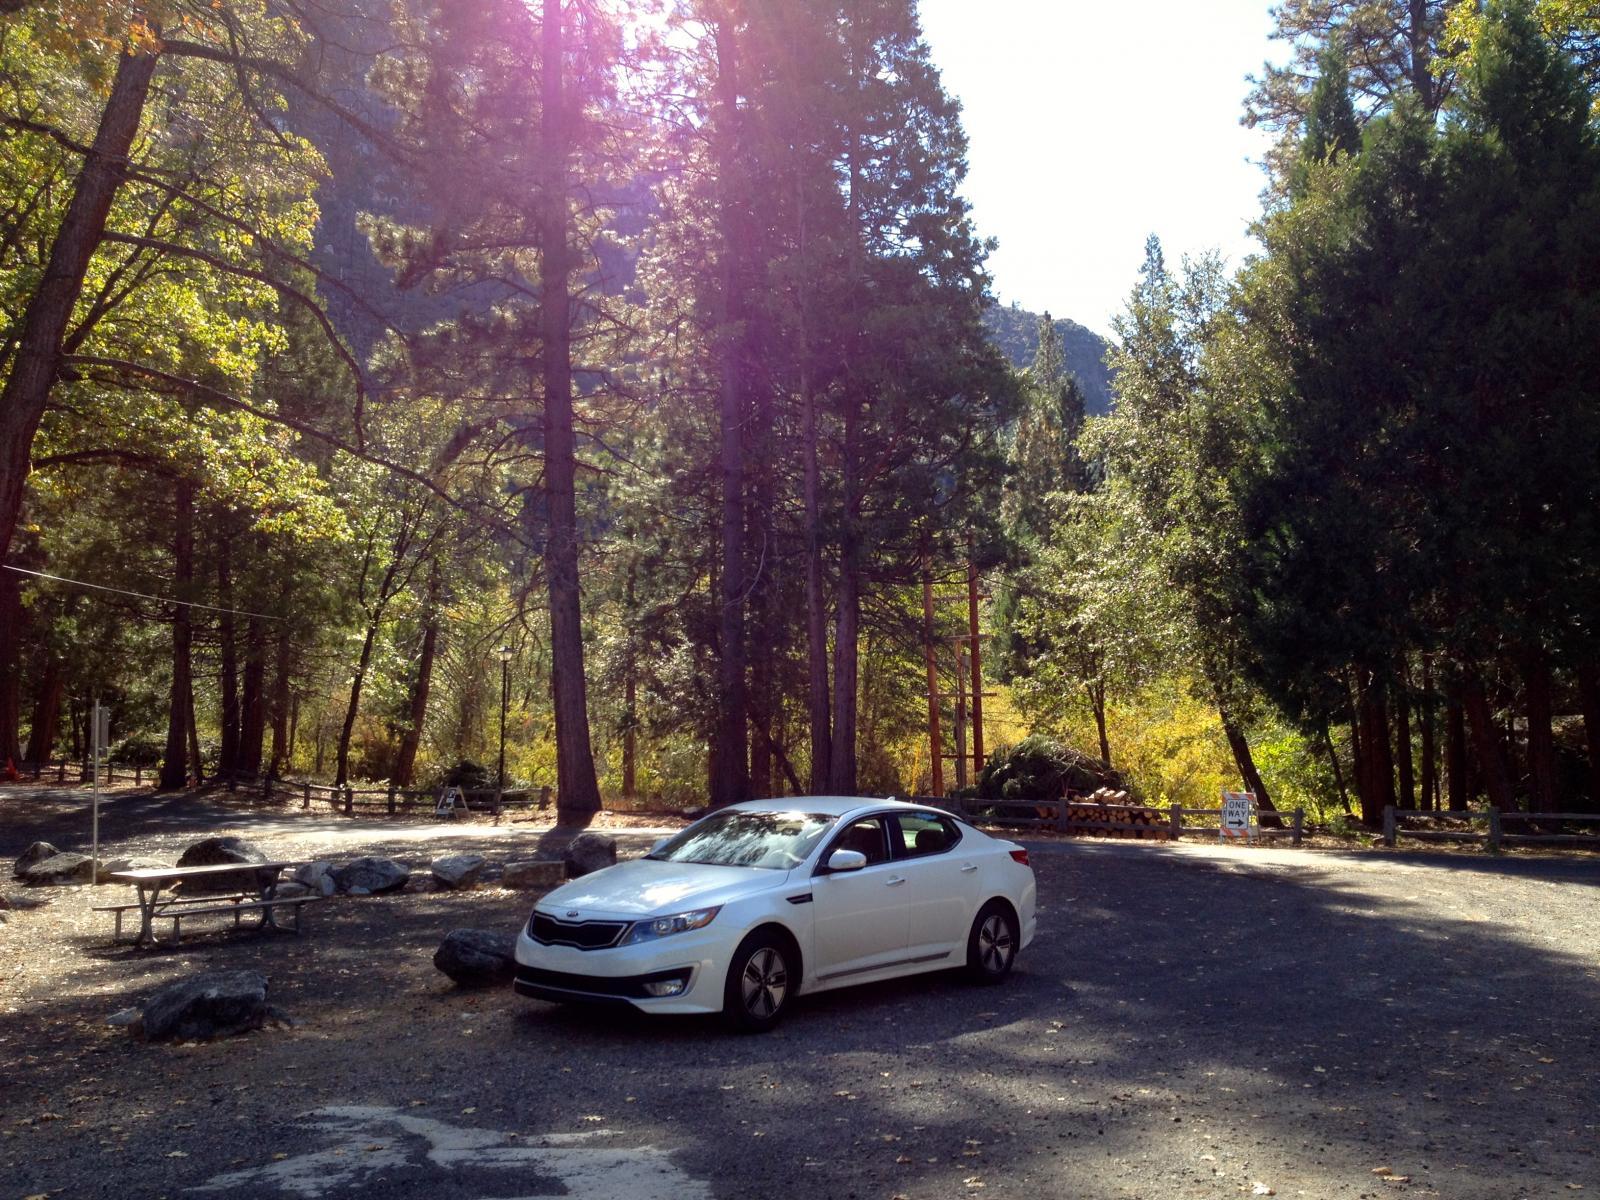 1st roadtrip in Hybrid to Yosemite